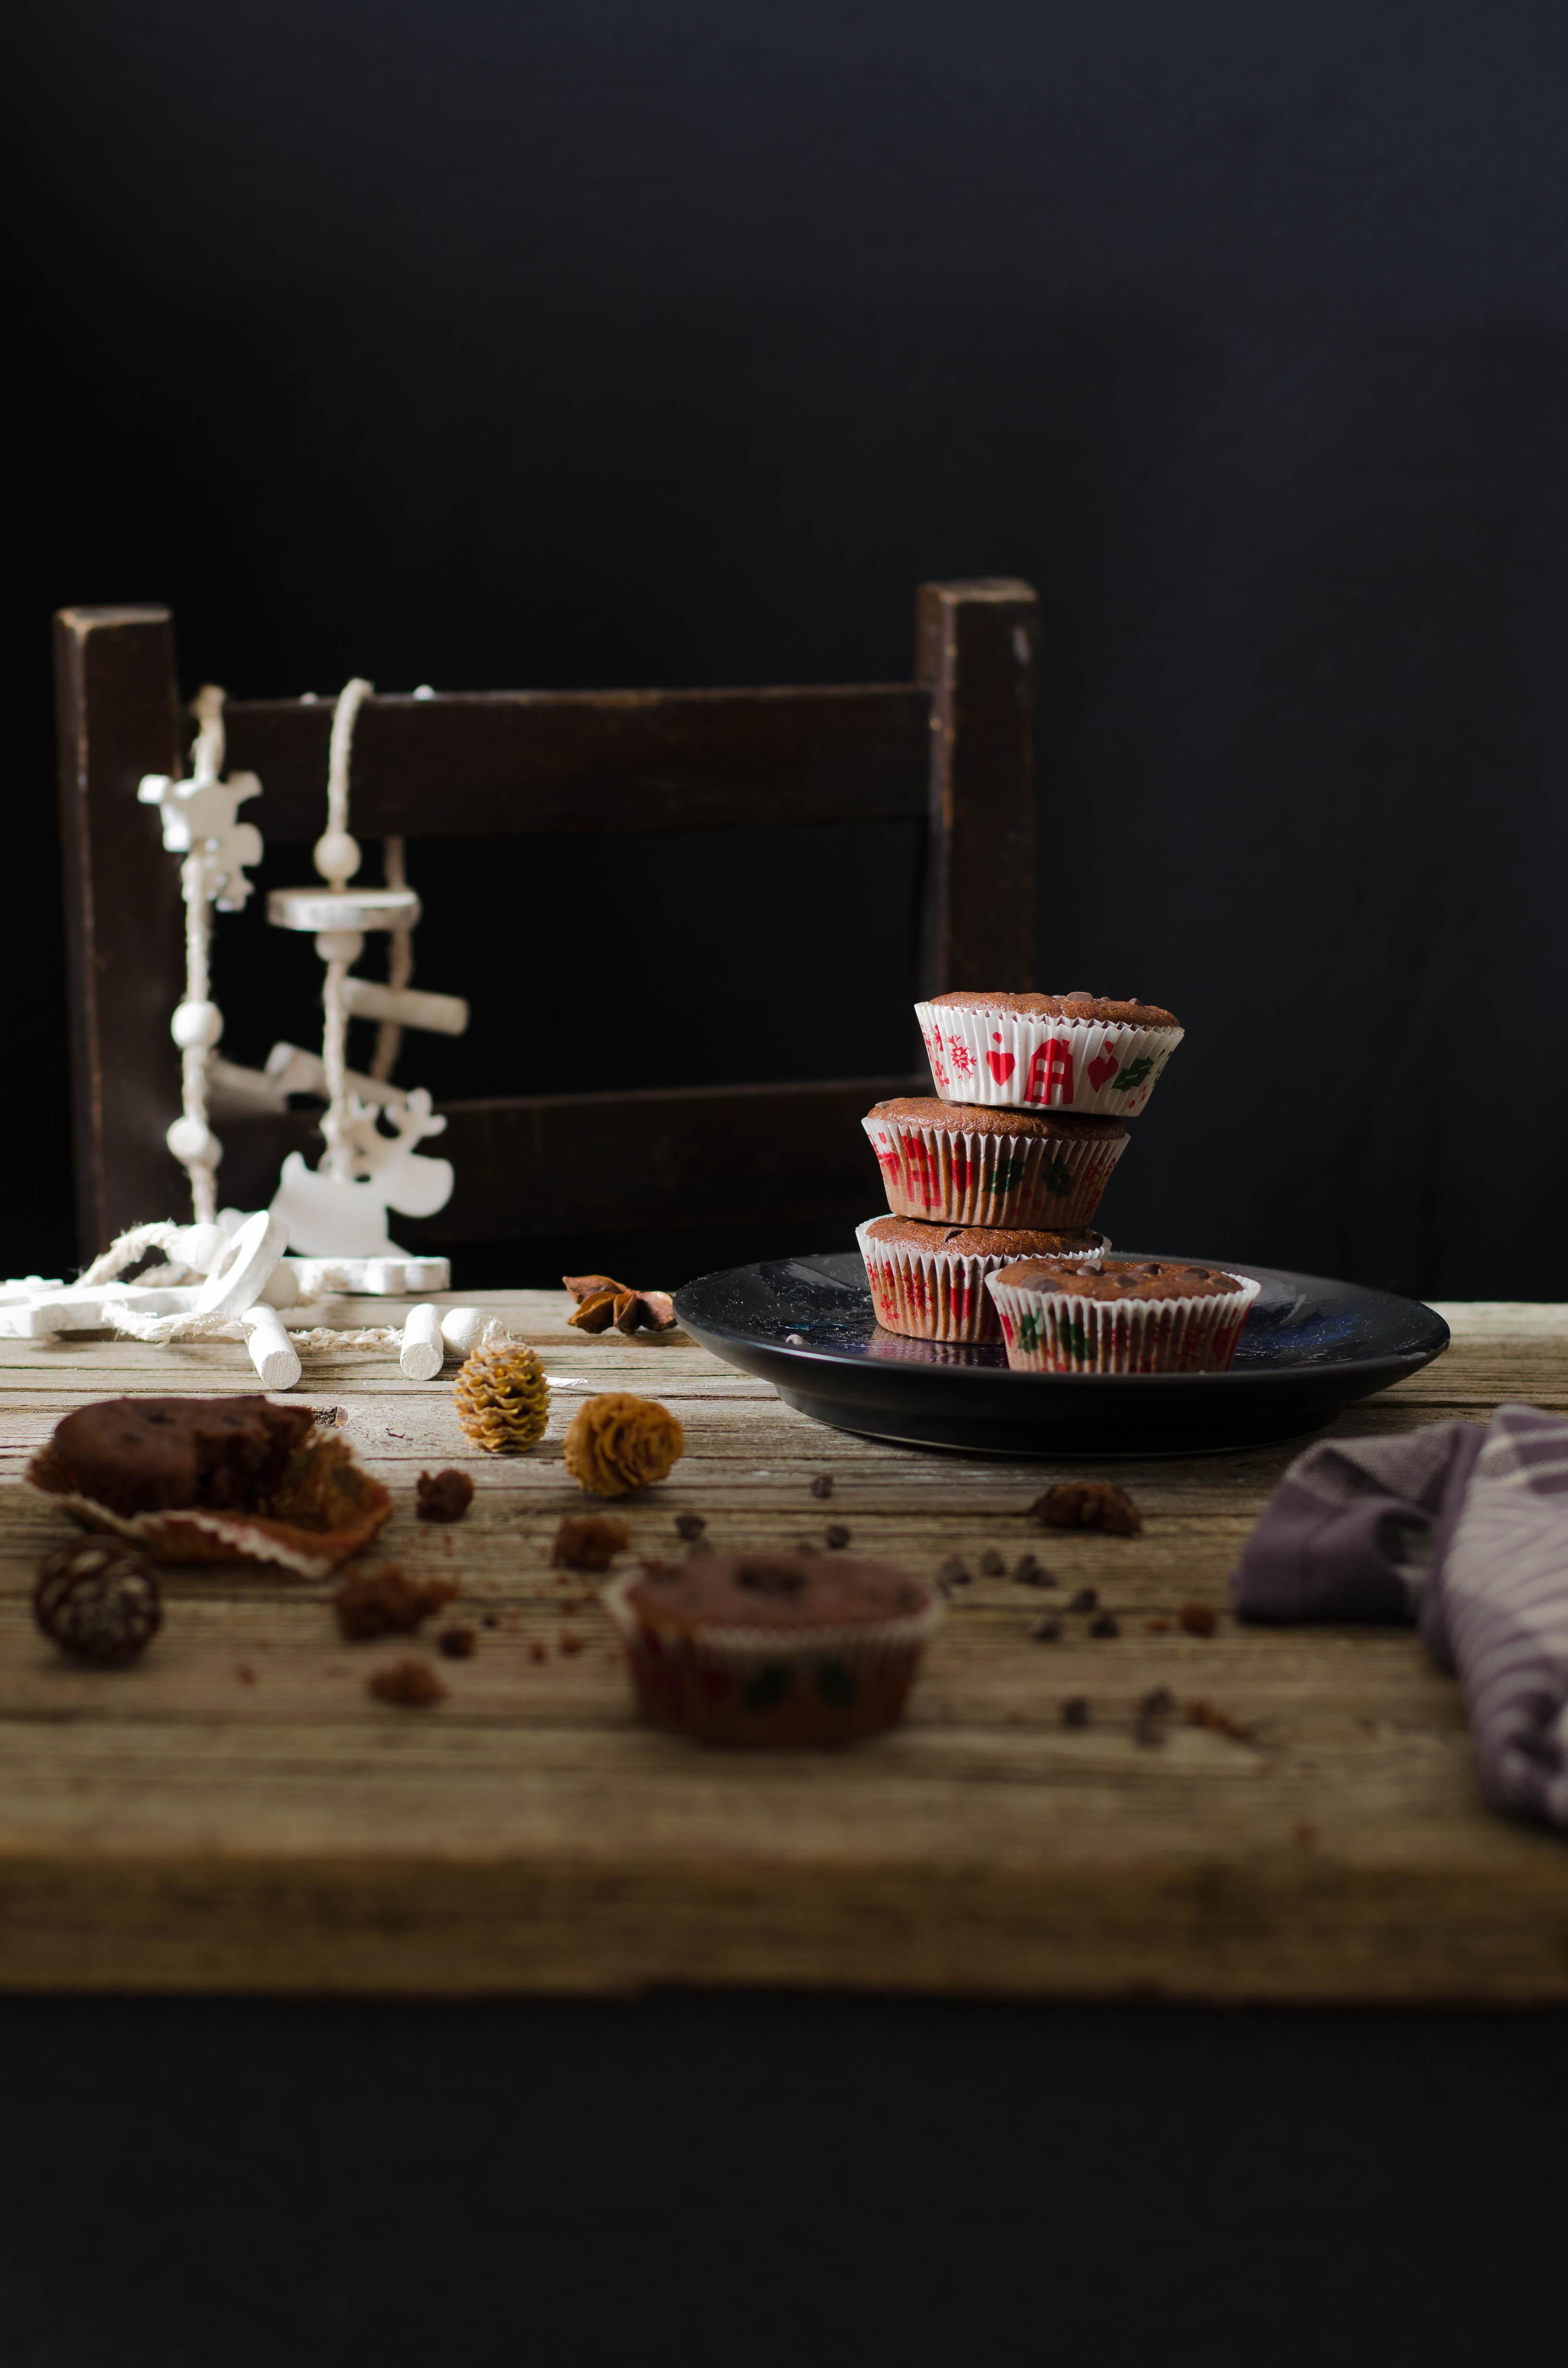 cupcake_cacao_meringa Cupcakes al doppio cioccolato, crema meringa, mascarpone e cacao